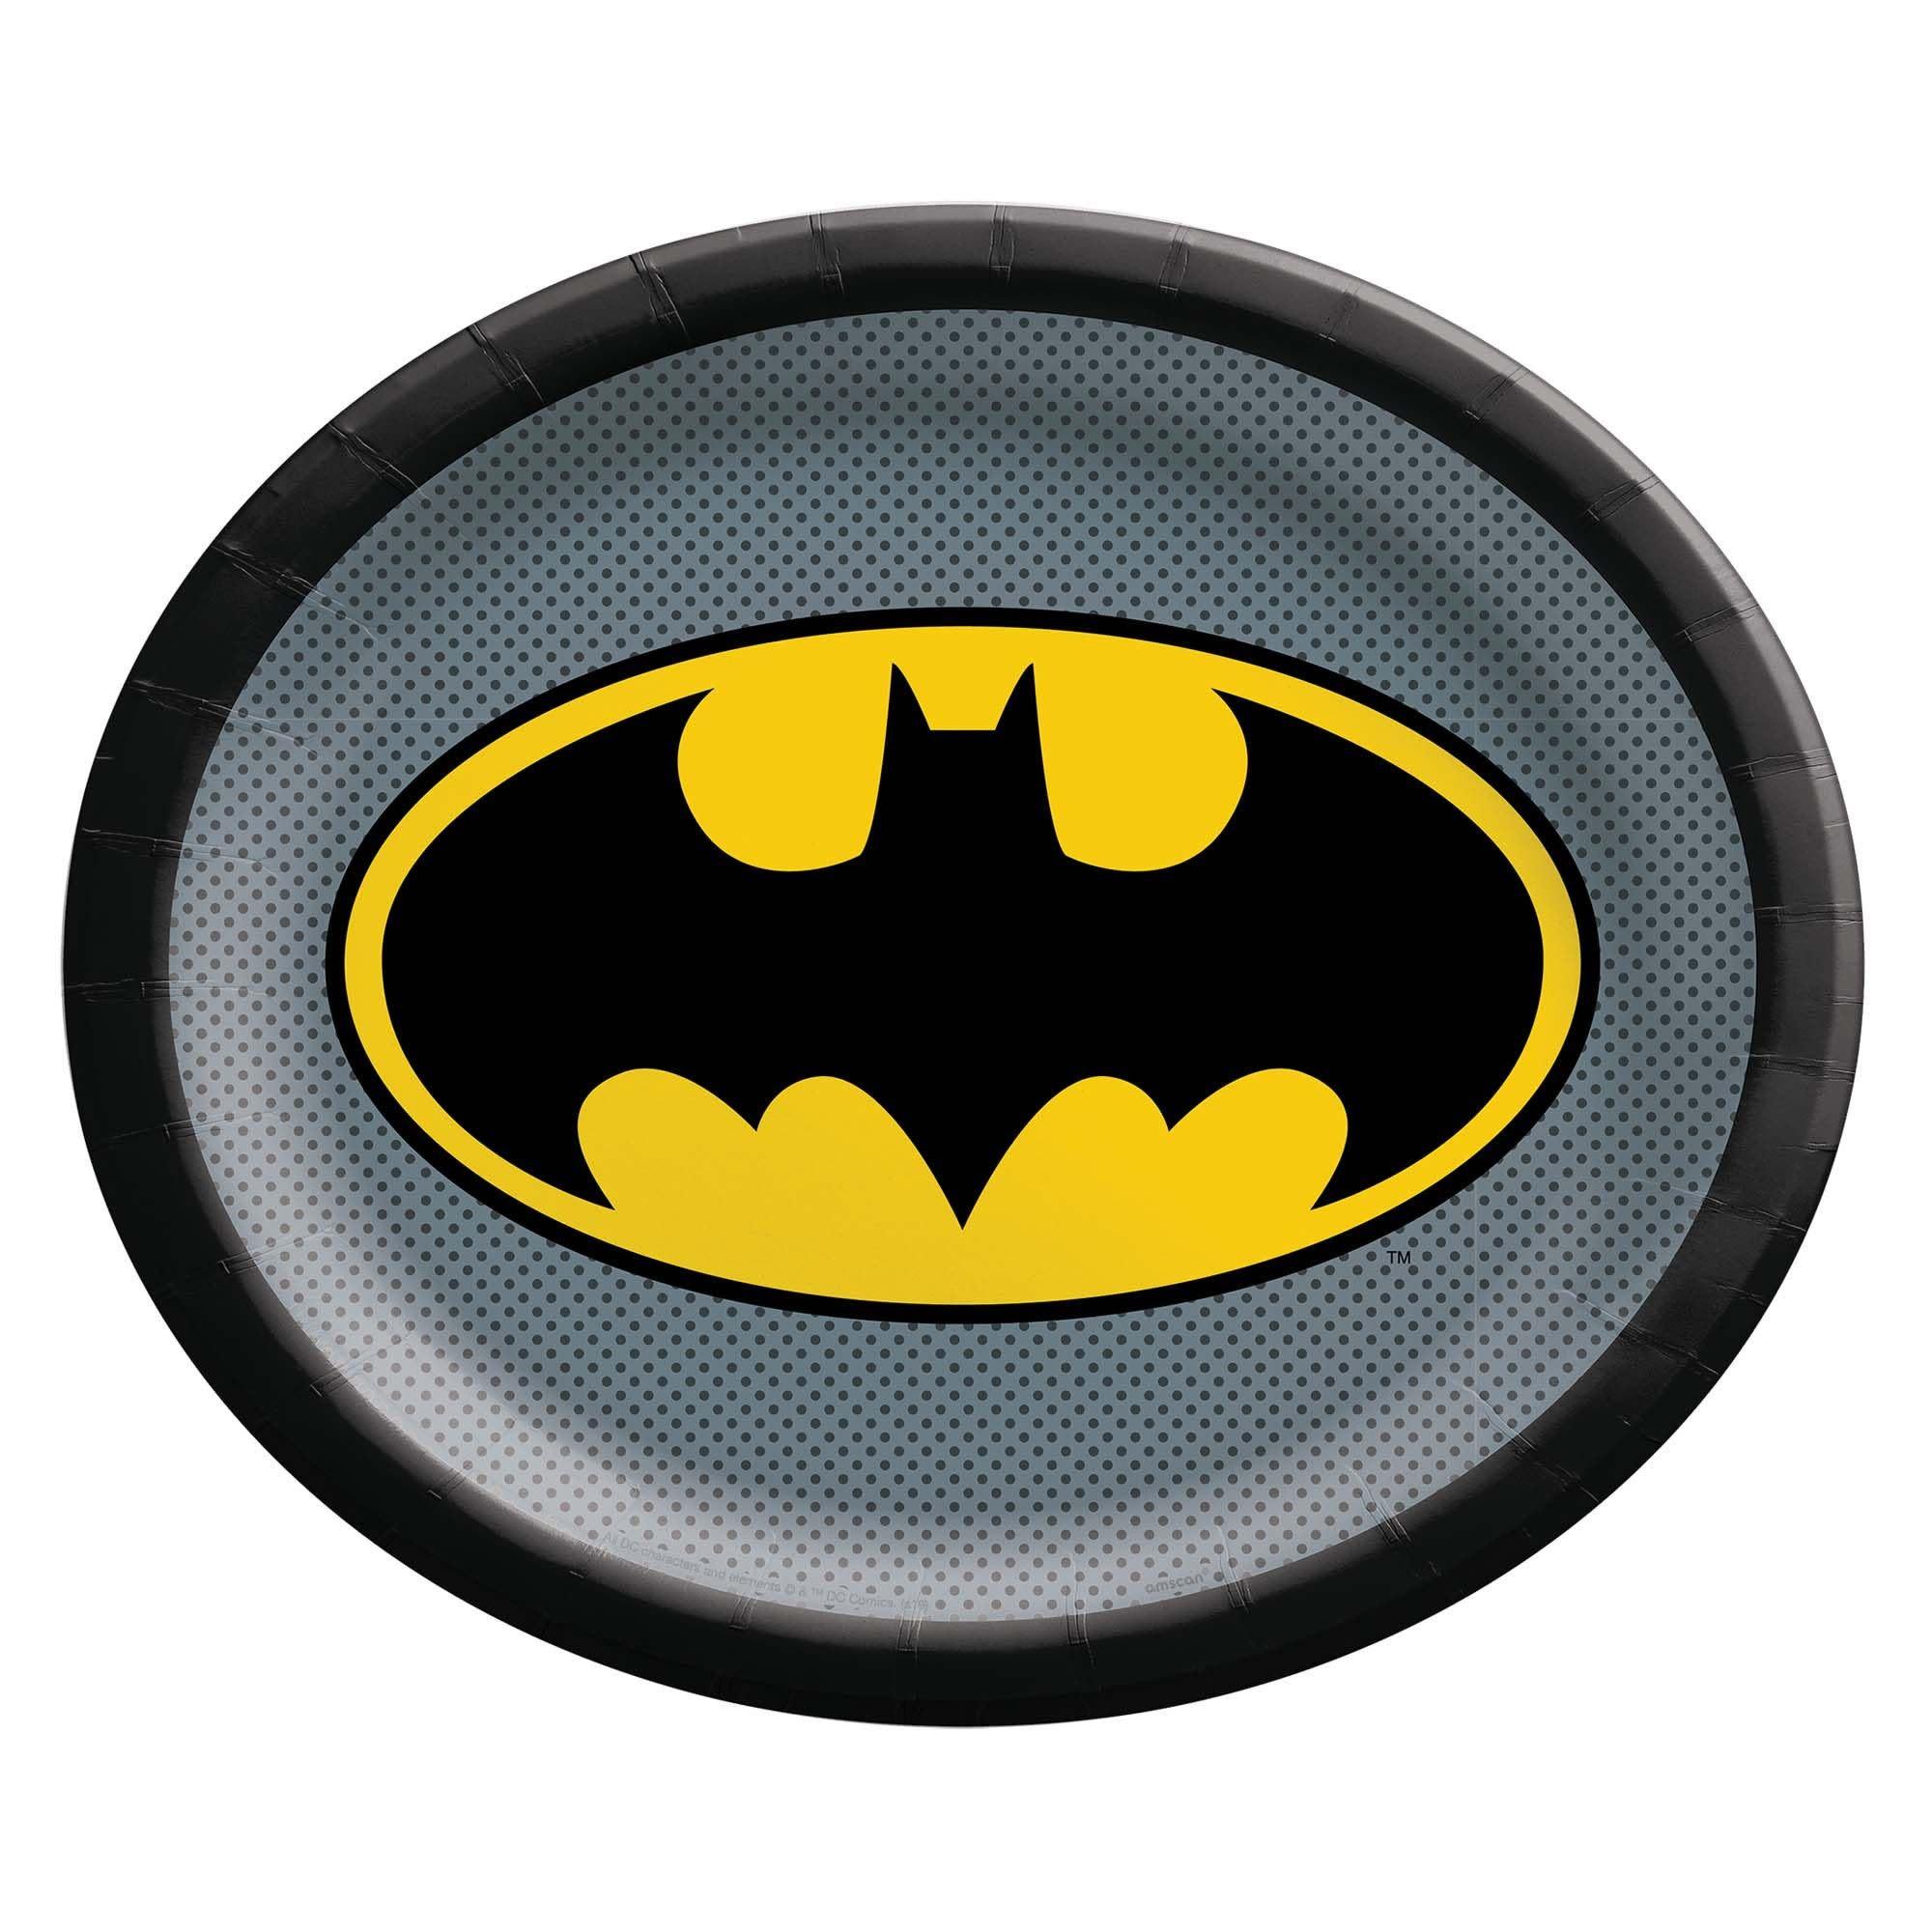 Batman™ Heroes Unite Oval Plate